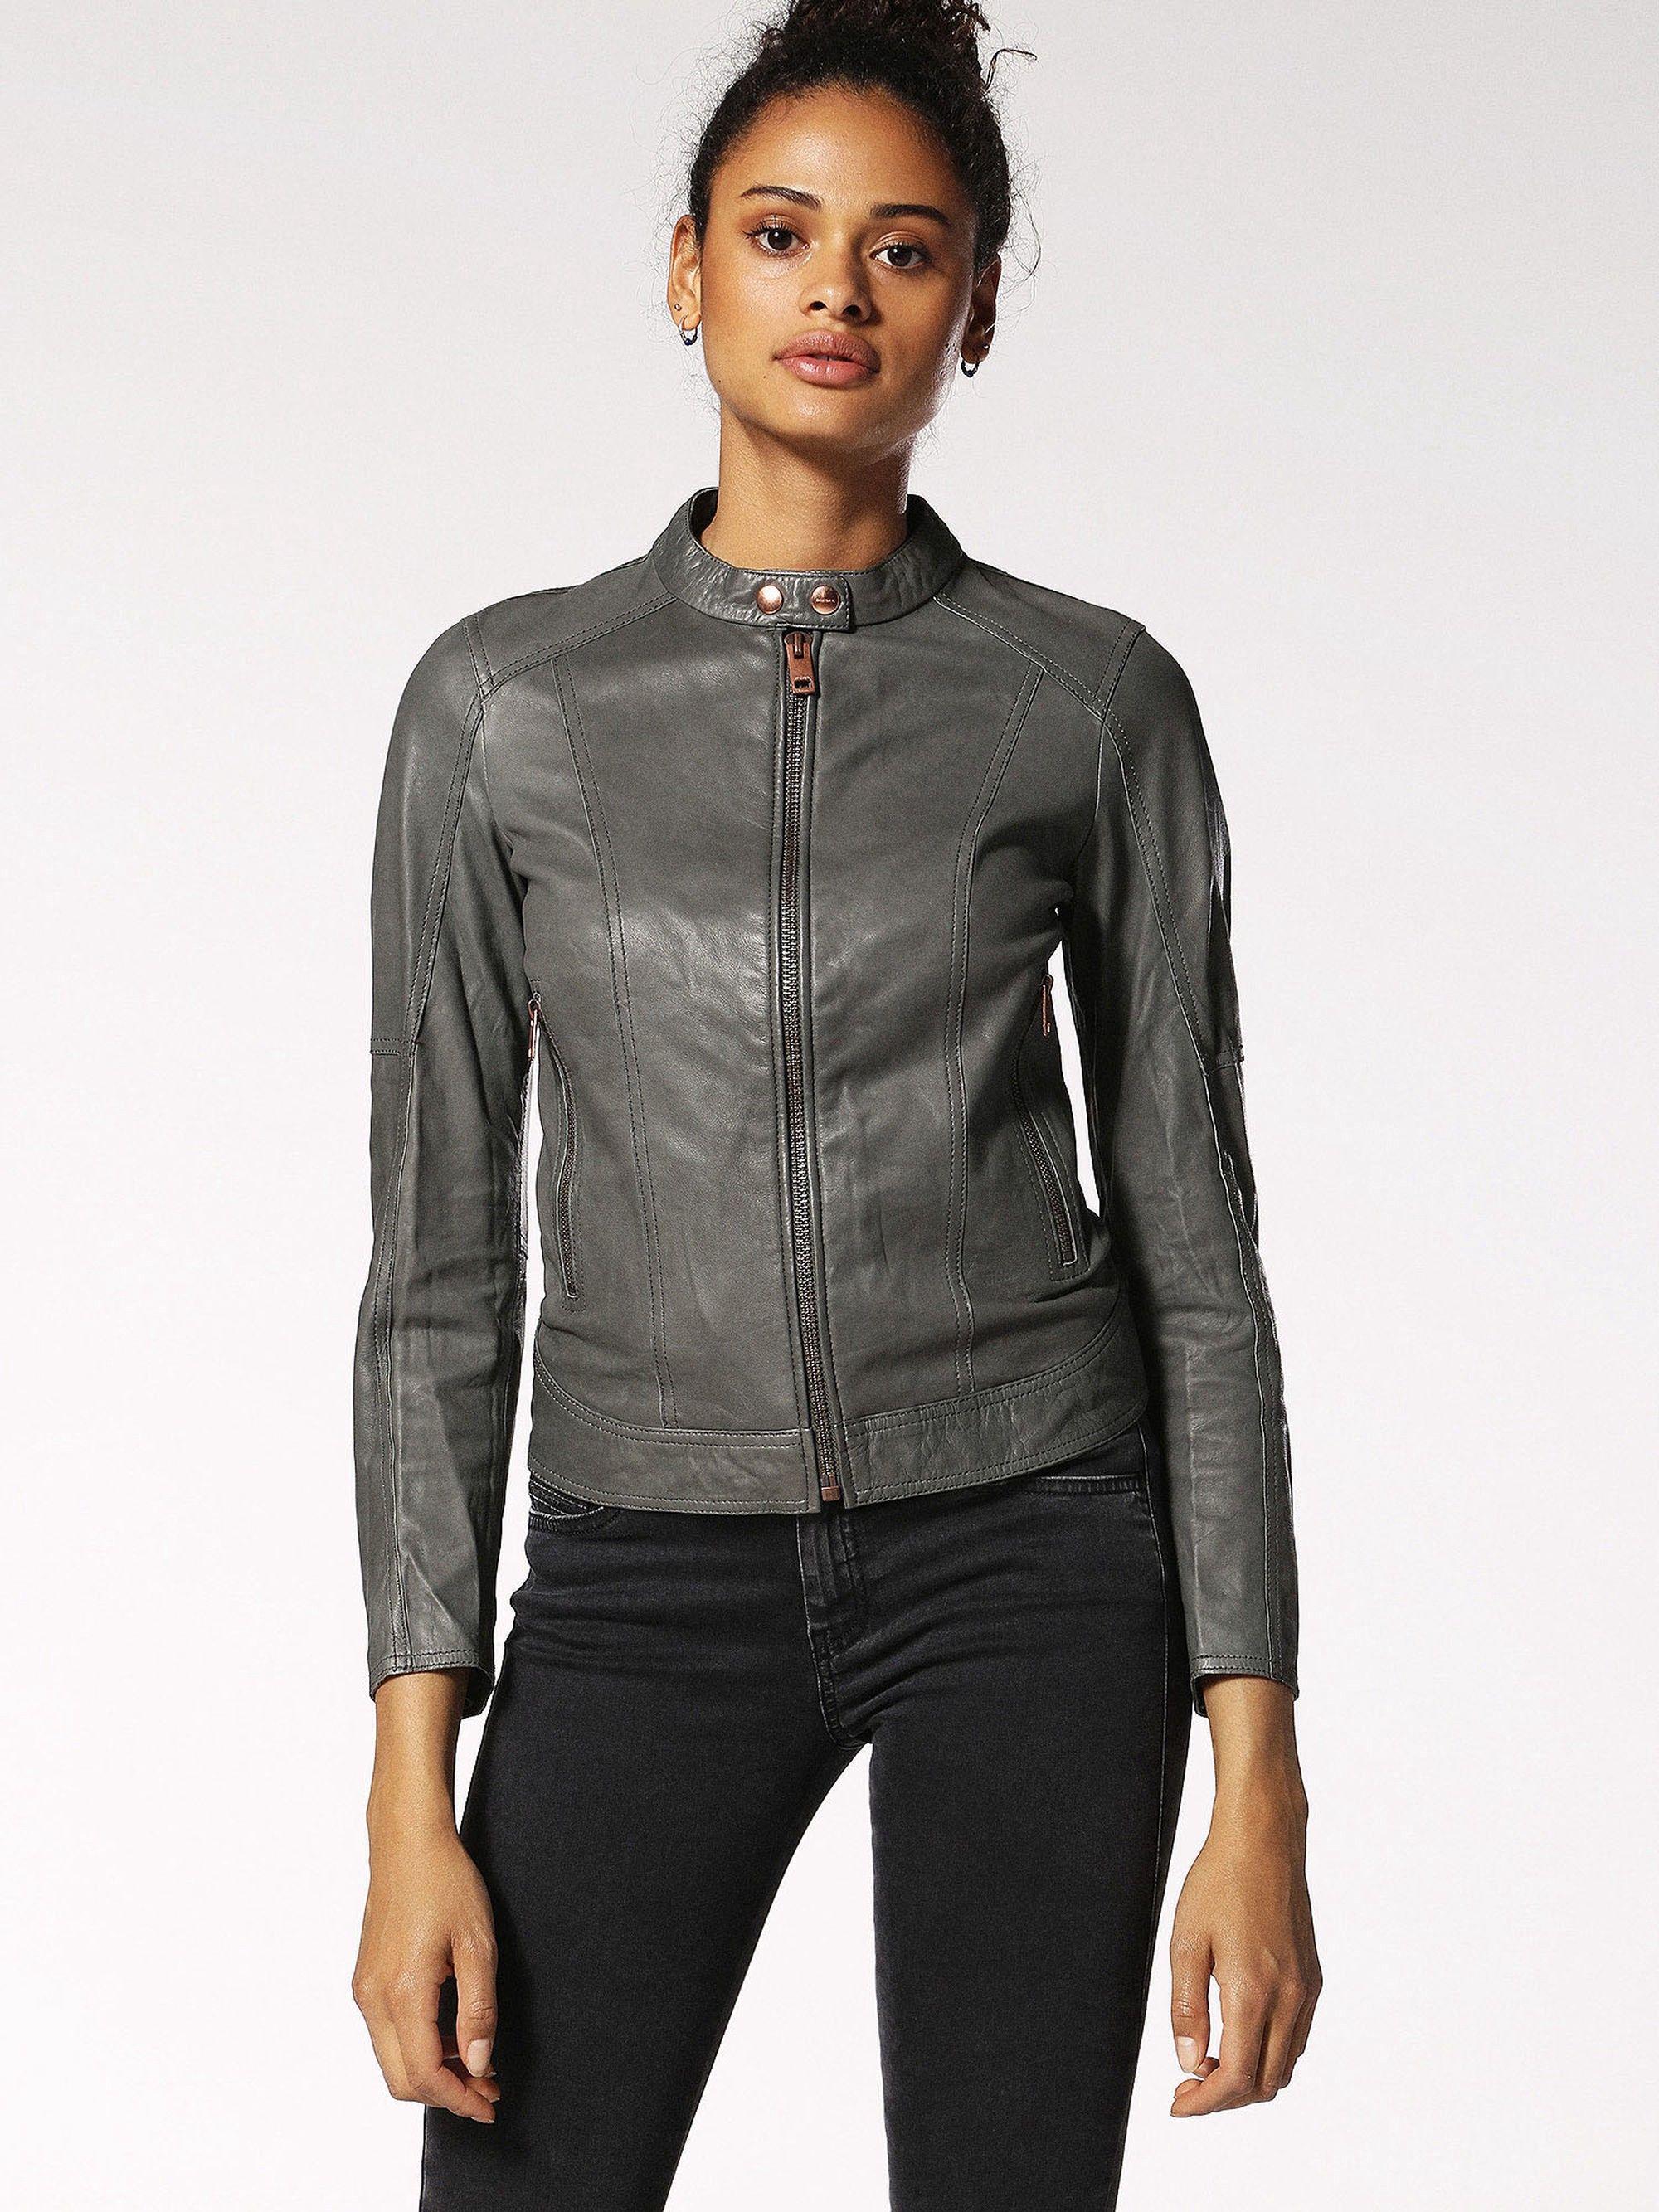 Diesel L Lory C Leather Jackets Diesel Cloth Jackets Jackets For Women Diesel Fashion [ 2667 x 2000 Pixel ]